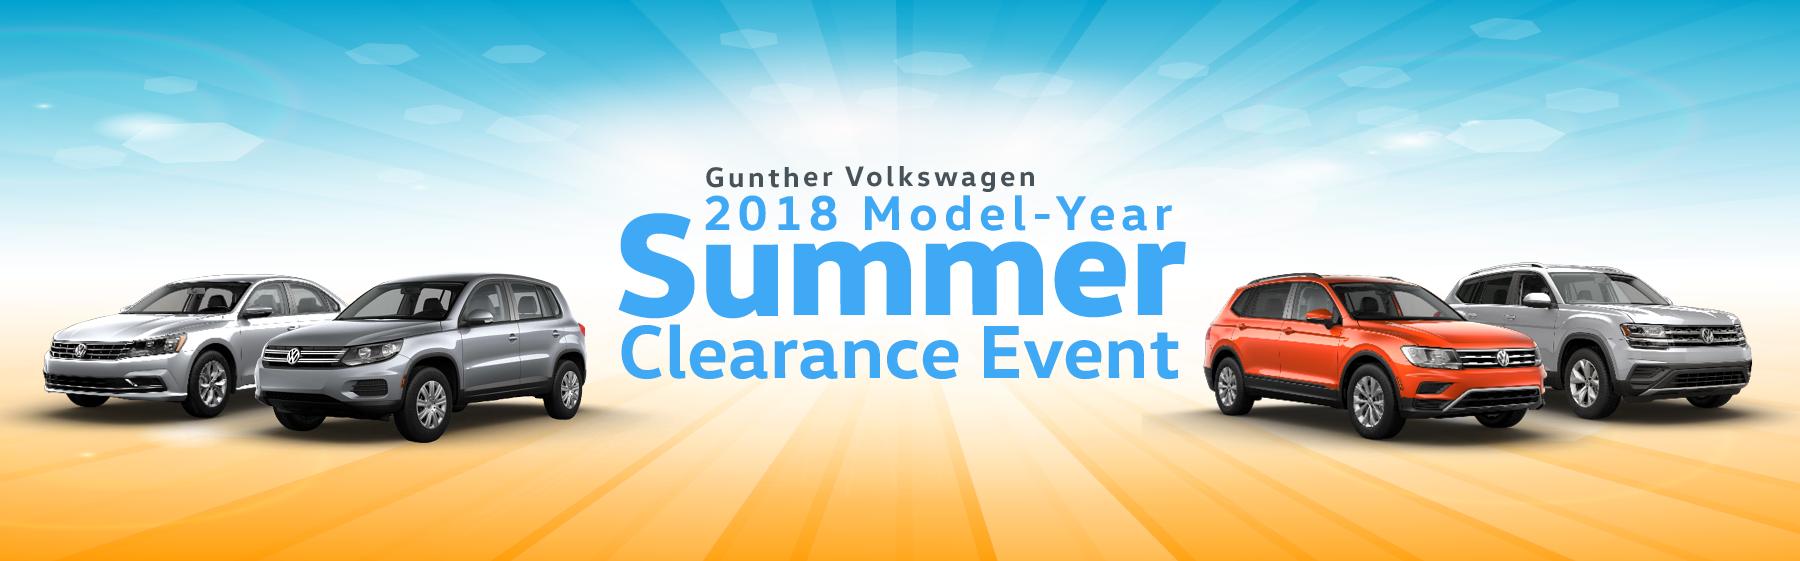 Gunther Volkswagen Summer Clearance Event